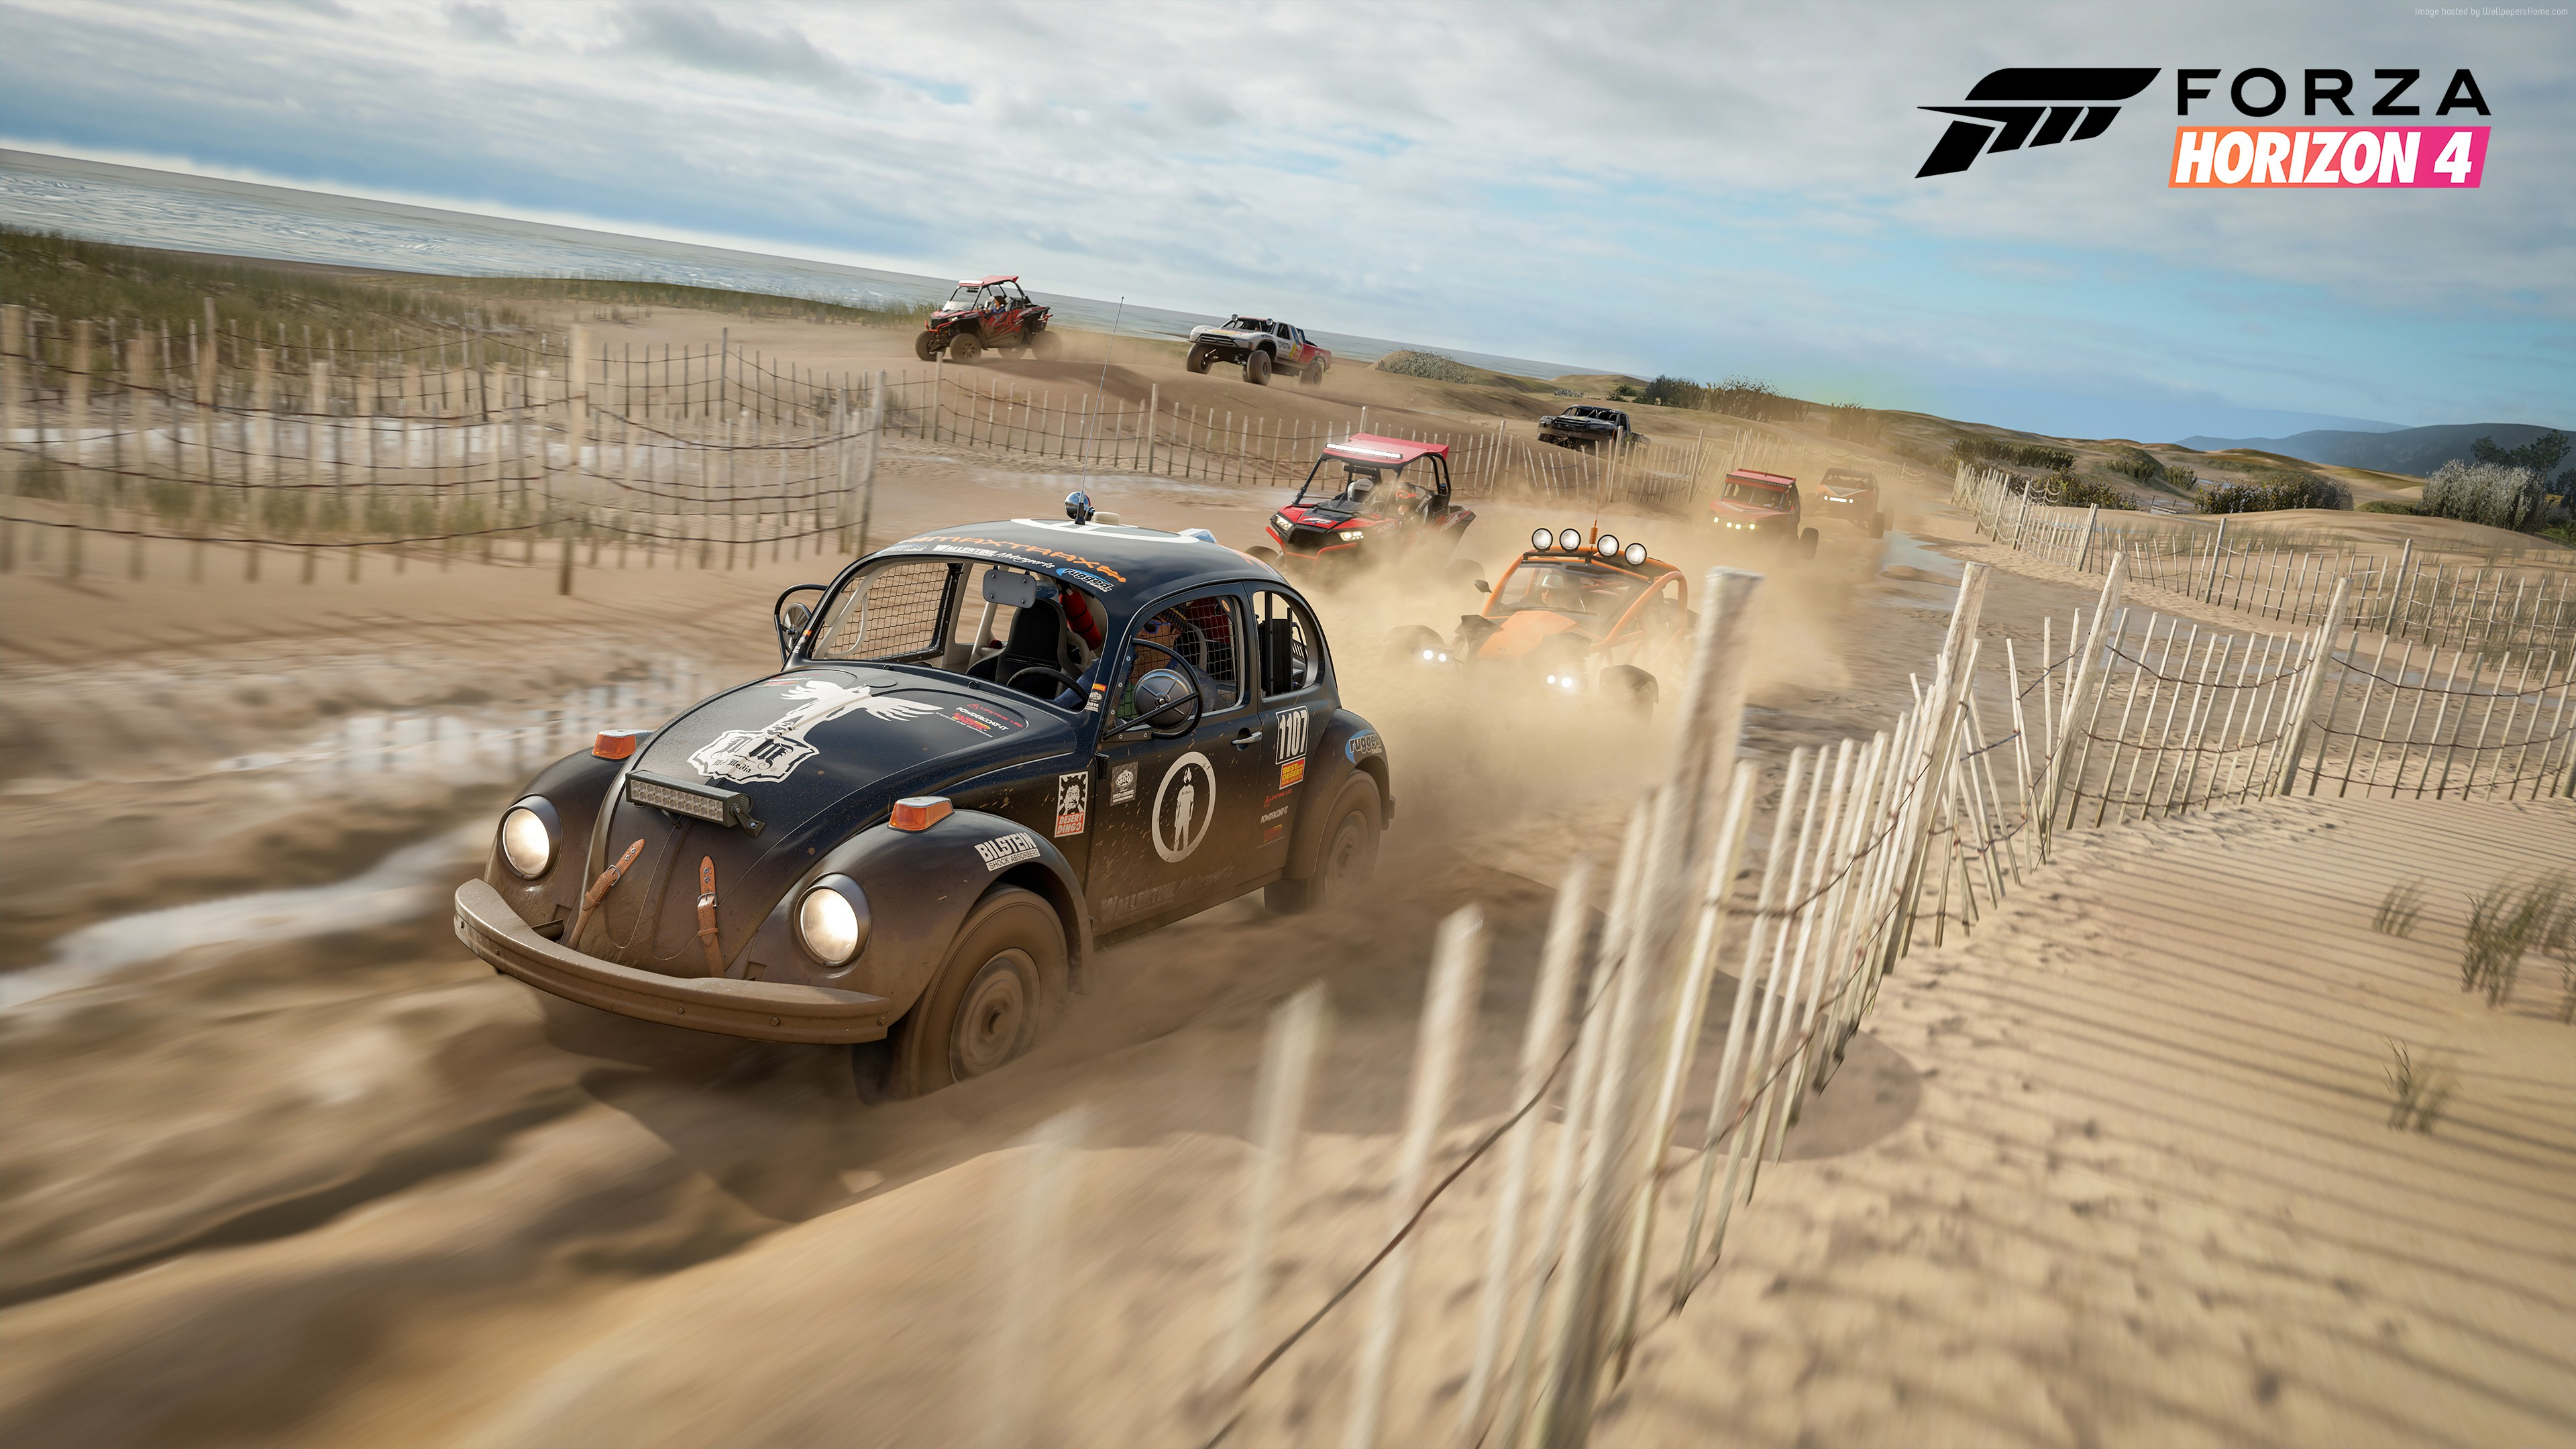 Forza Horizon 4 4k Ultra HD Wallpaper Background Image